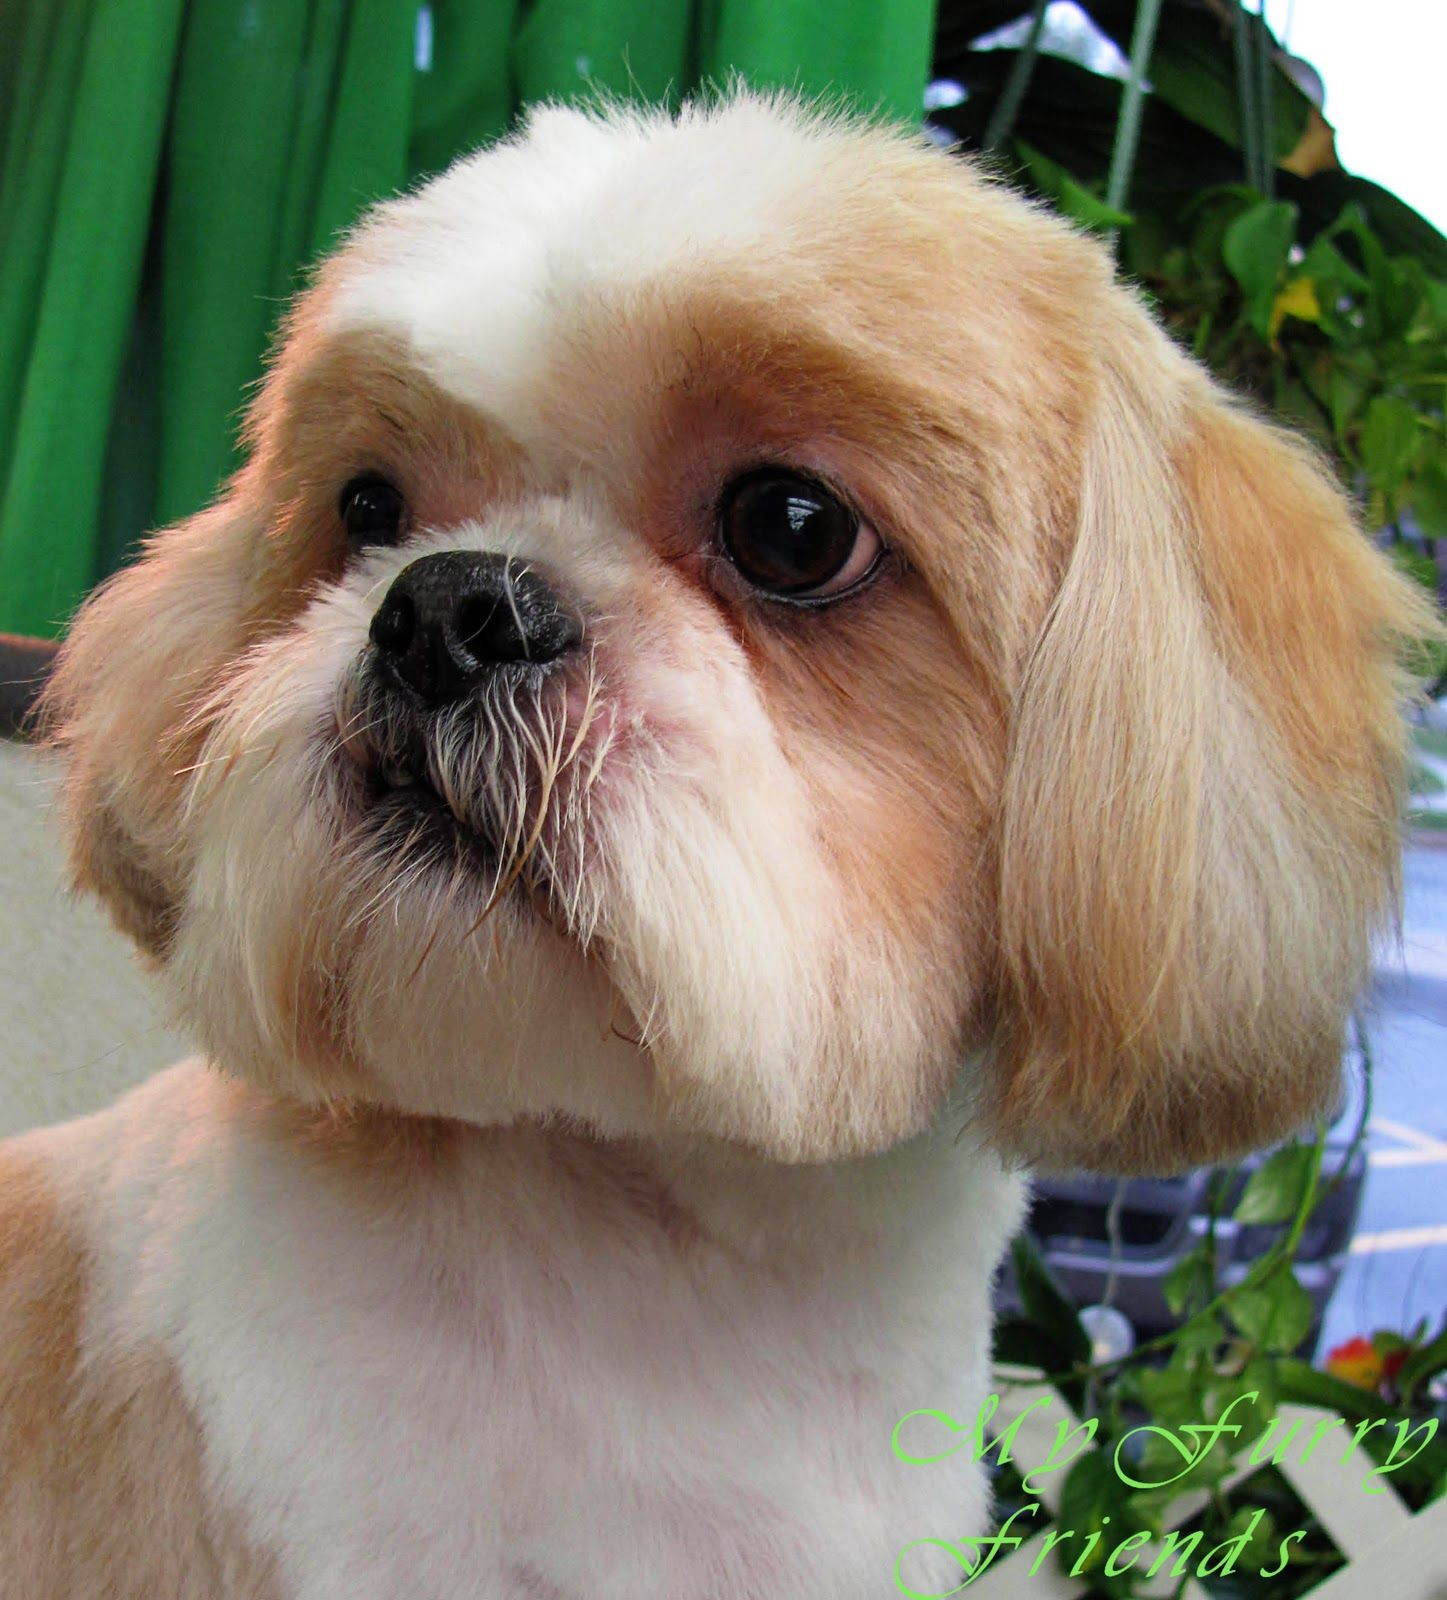 shitzu+grooming | Pet Grooming: The Good, The Bad, & The Furry: Scissoring a Shih-Tzu ...